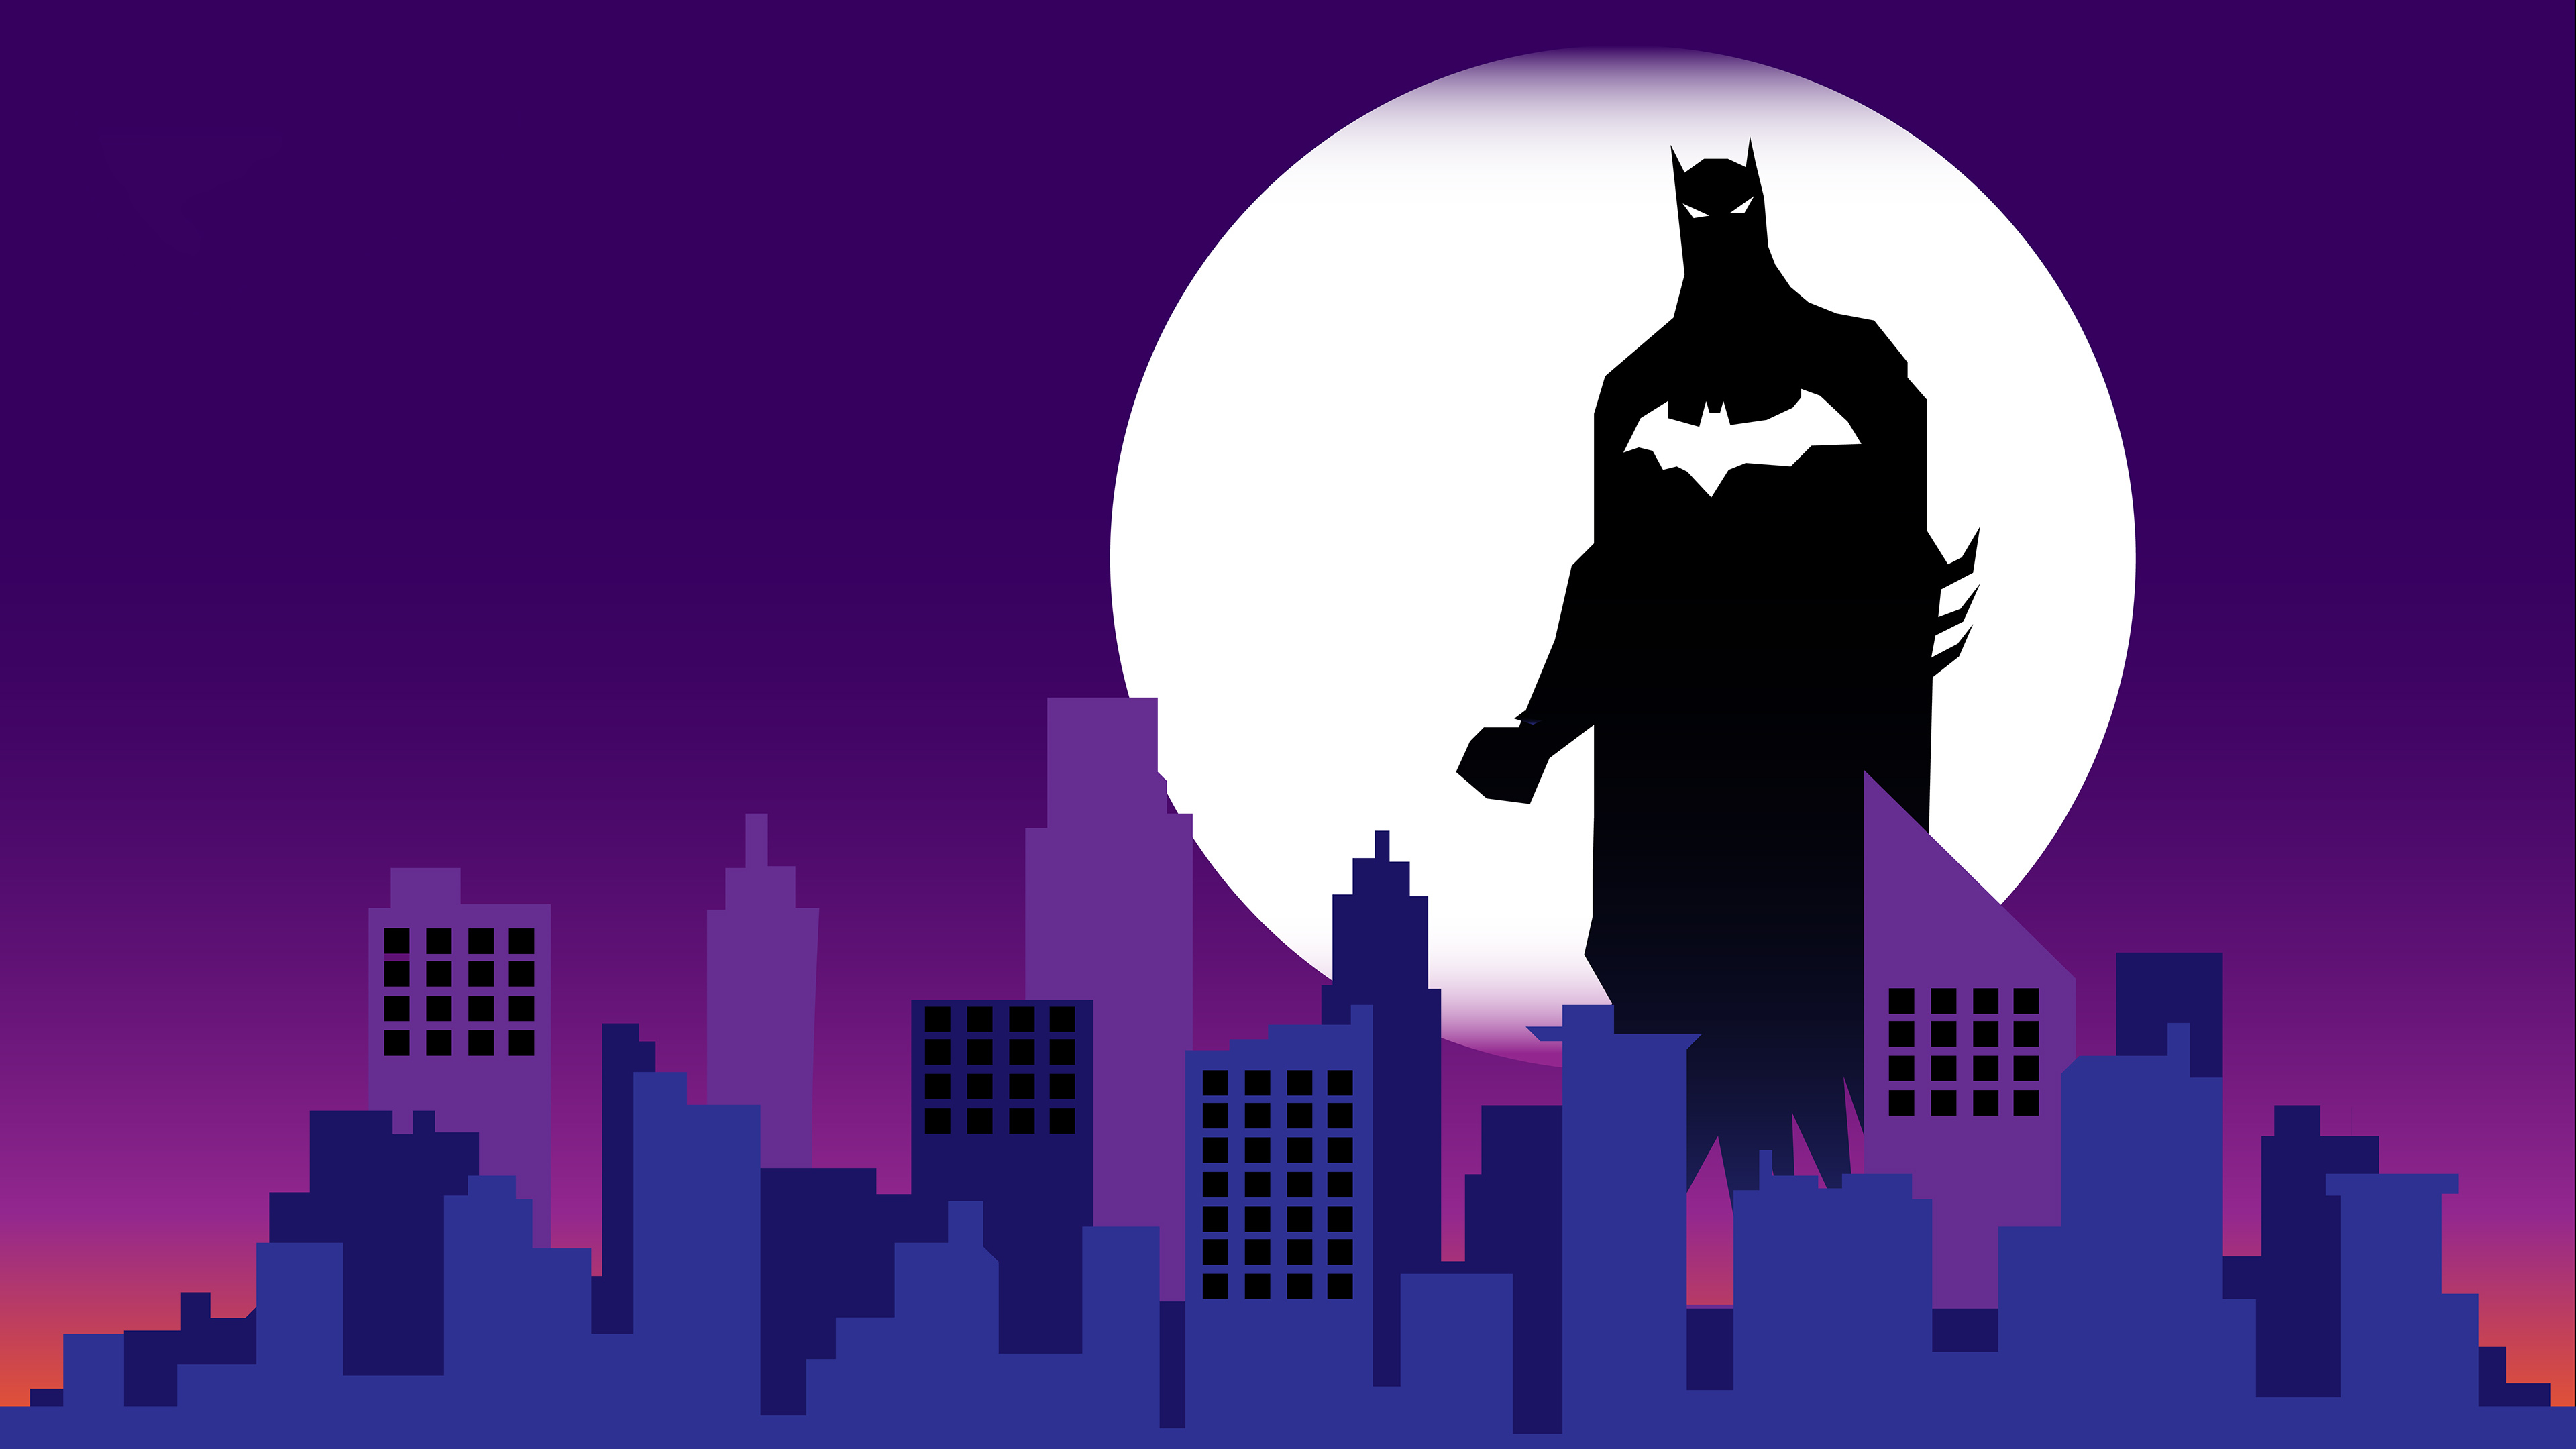 batman undiscovered 1568054847 - Batman Undiscovered - superheroes wallpapers, hd-wallpapers, digital art wallpapers, behance wallpapers, batman wallpapers, artwork wallpapers, 4k-wallpapers